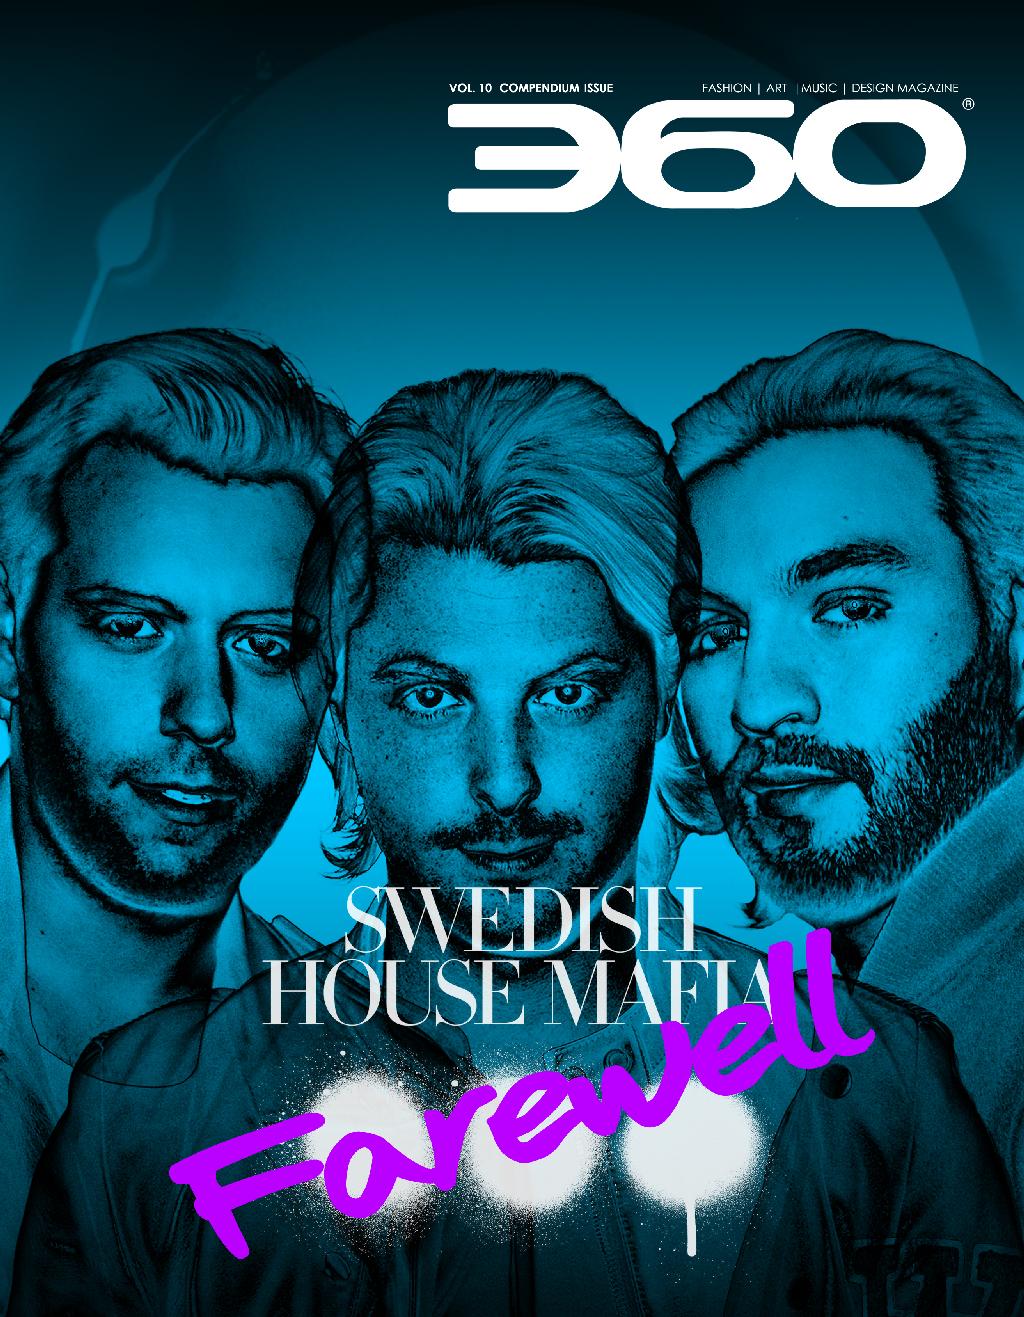 360 Issue 19 – Swedish House Mafia